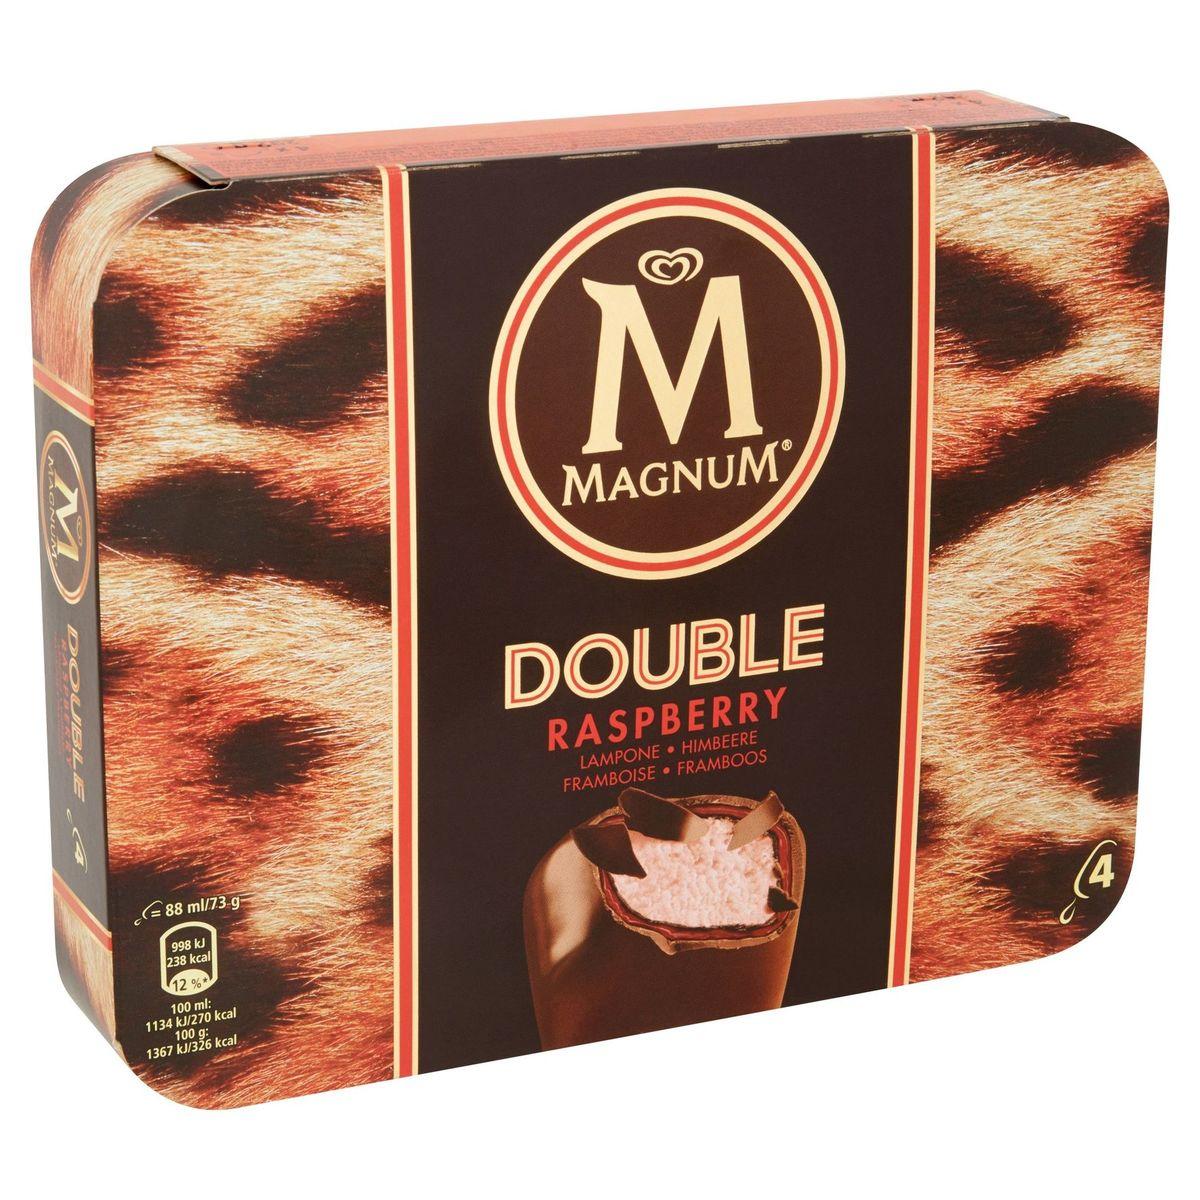 Magnum Ola Ijs Multipack Double Raspberry 4 x 88 ml